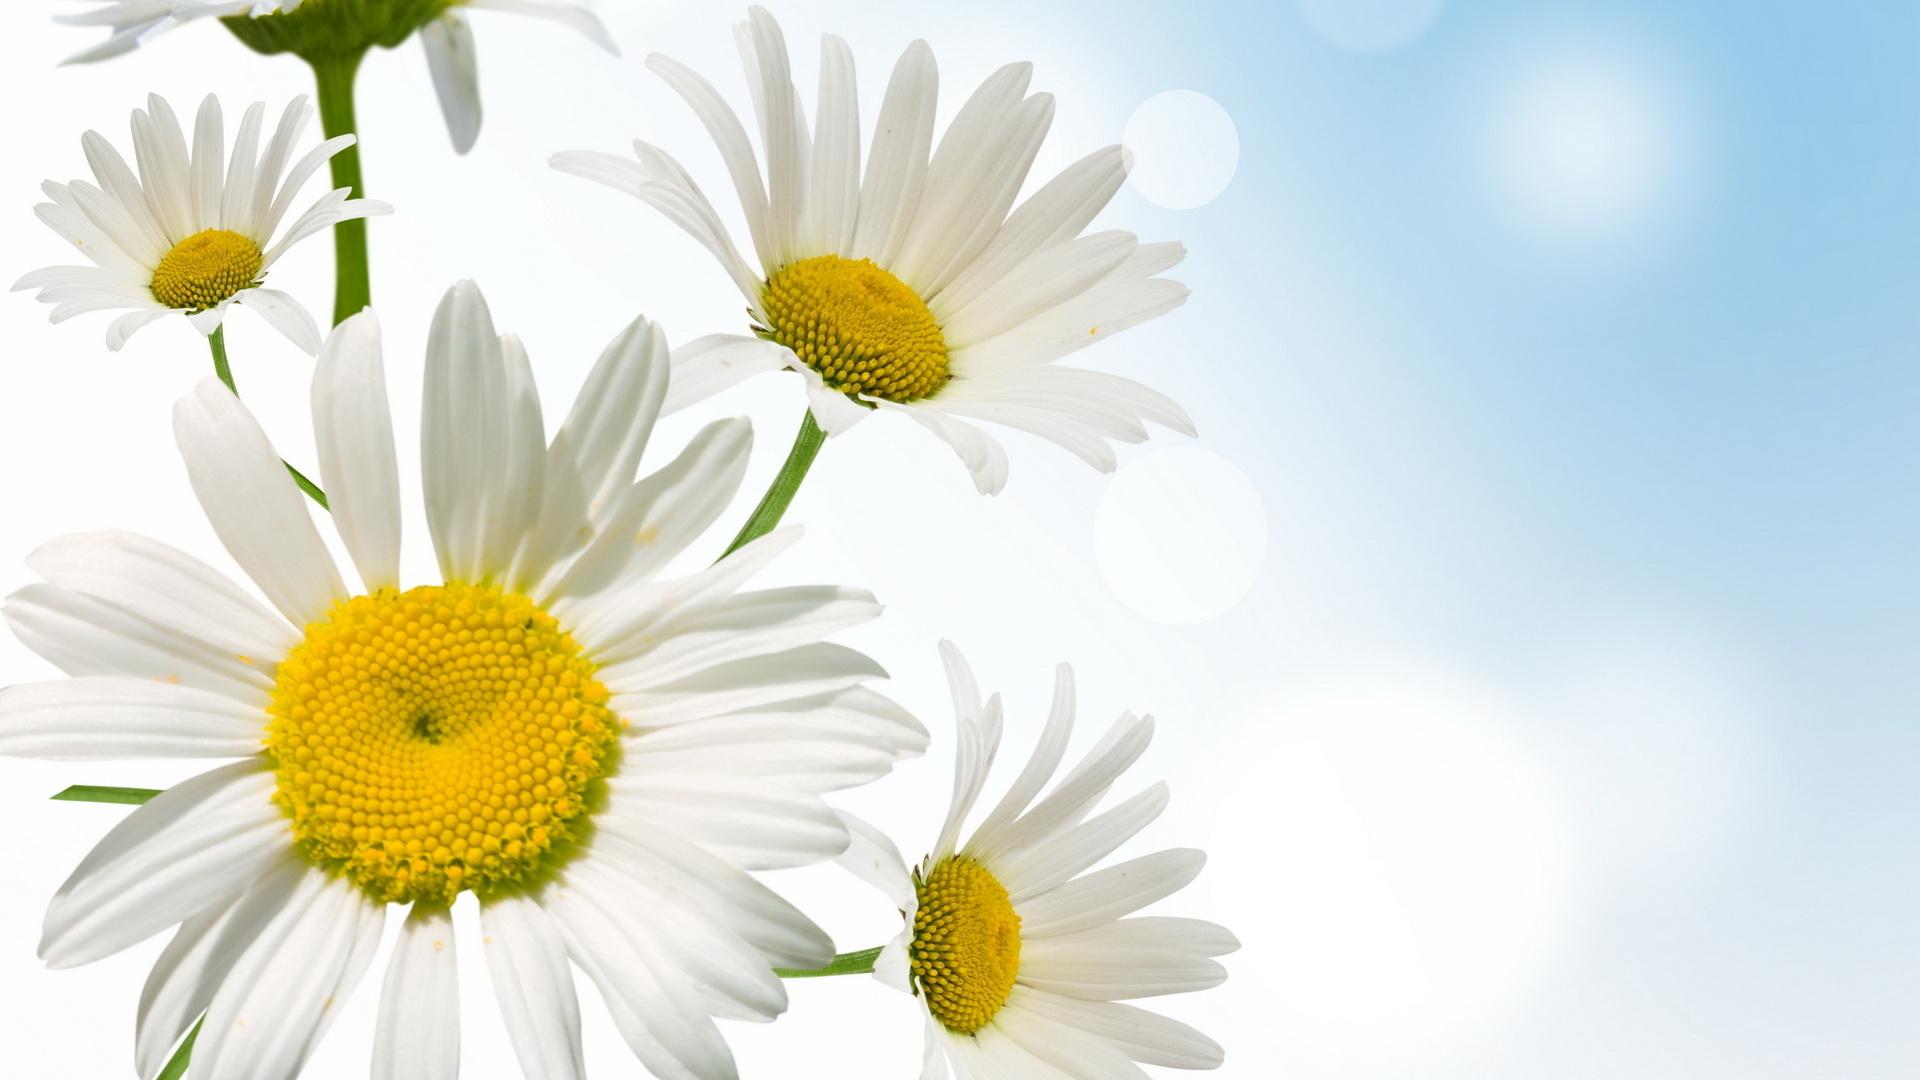 hinh anh hoa cuc dep 13